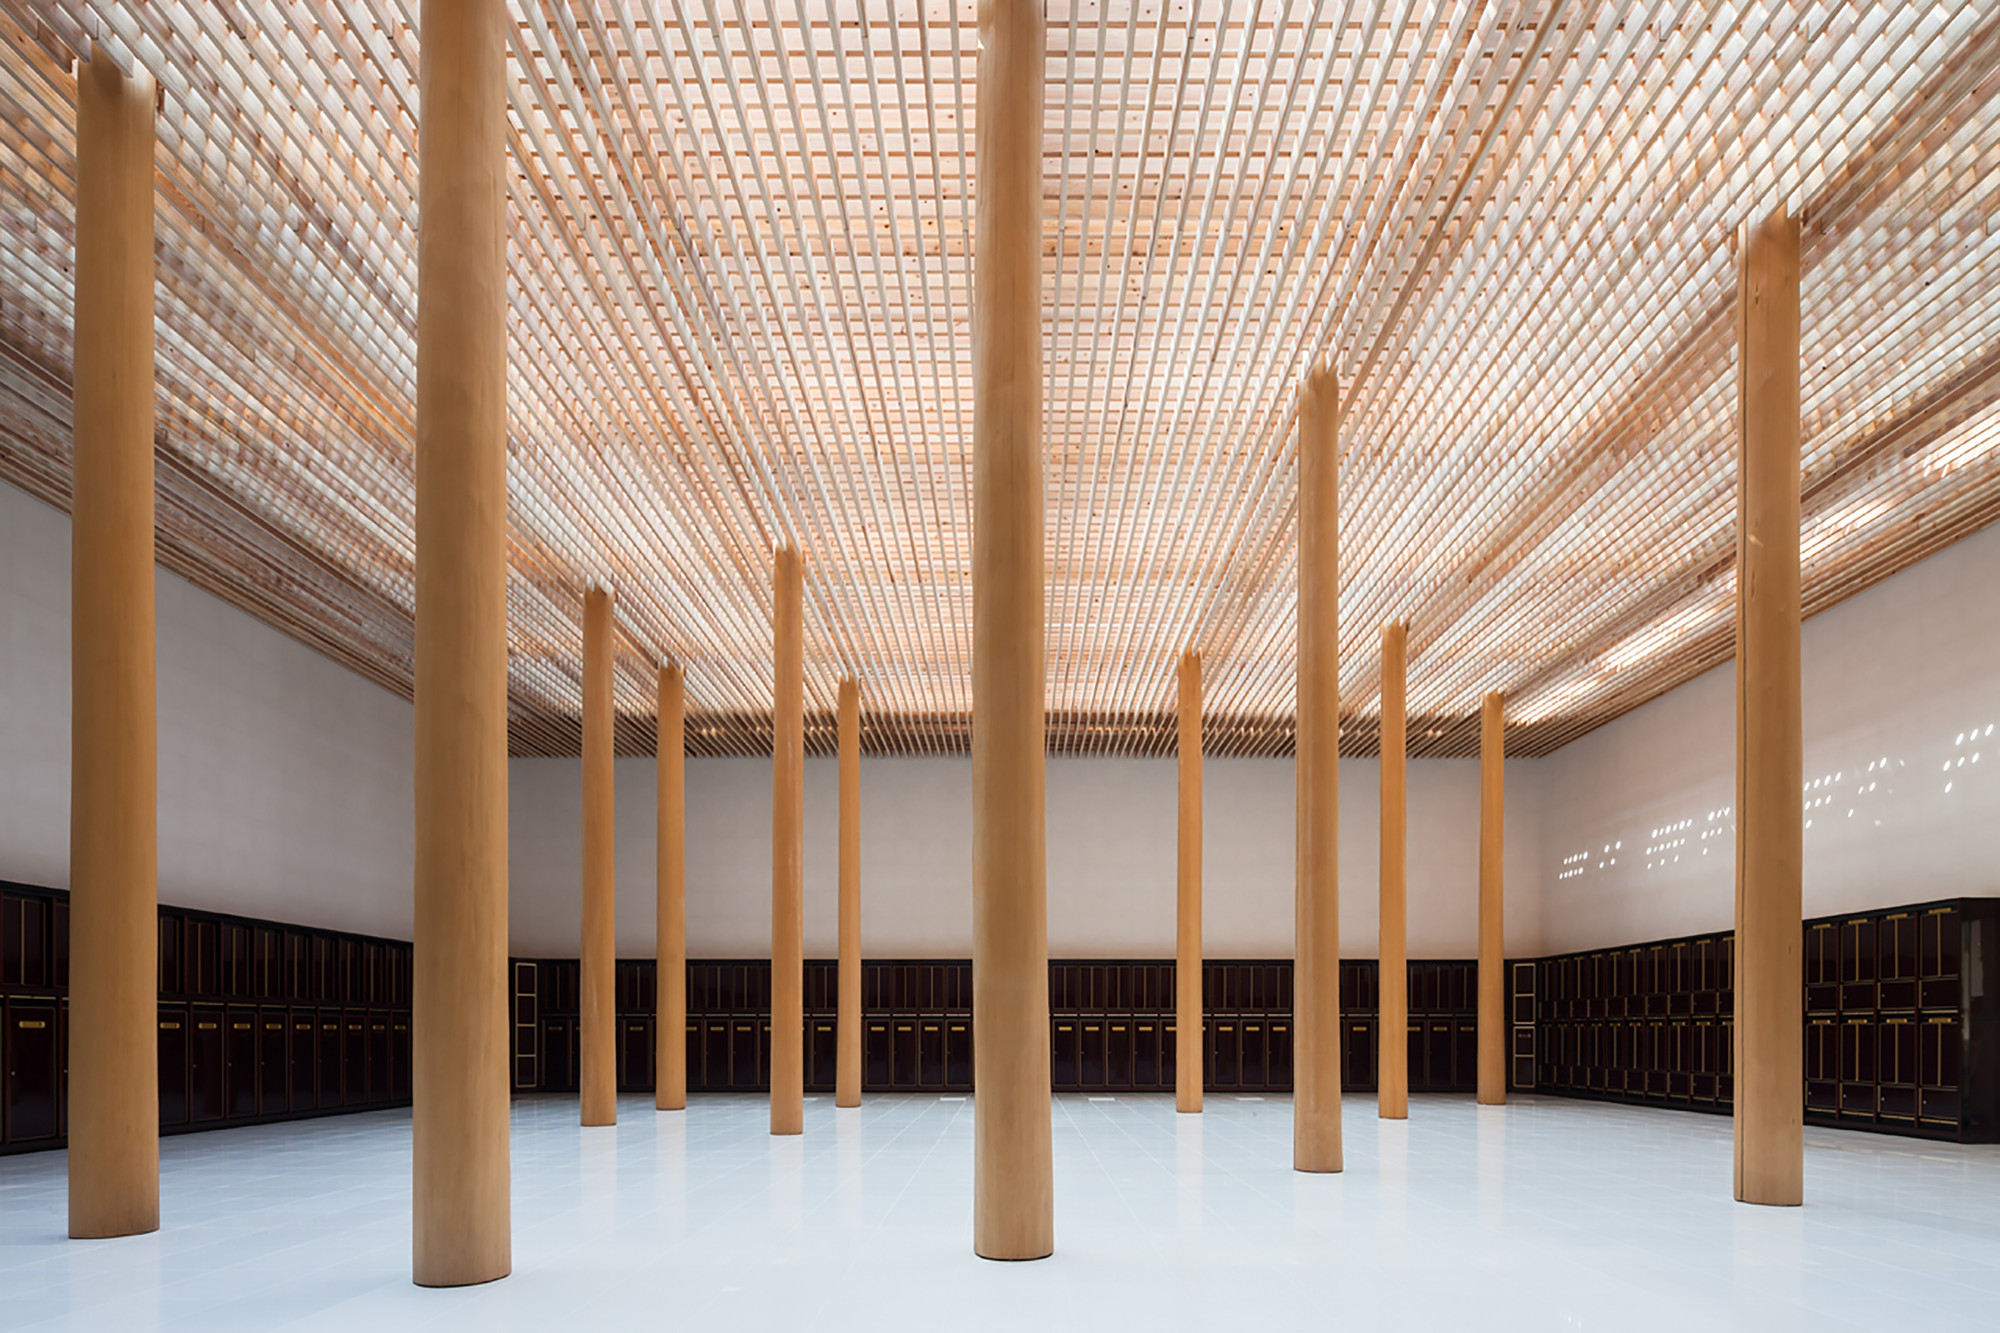 Myoenji columbarium furumori koichi architectural design for Architectural decoration